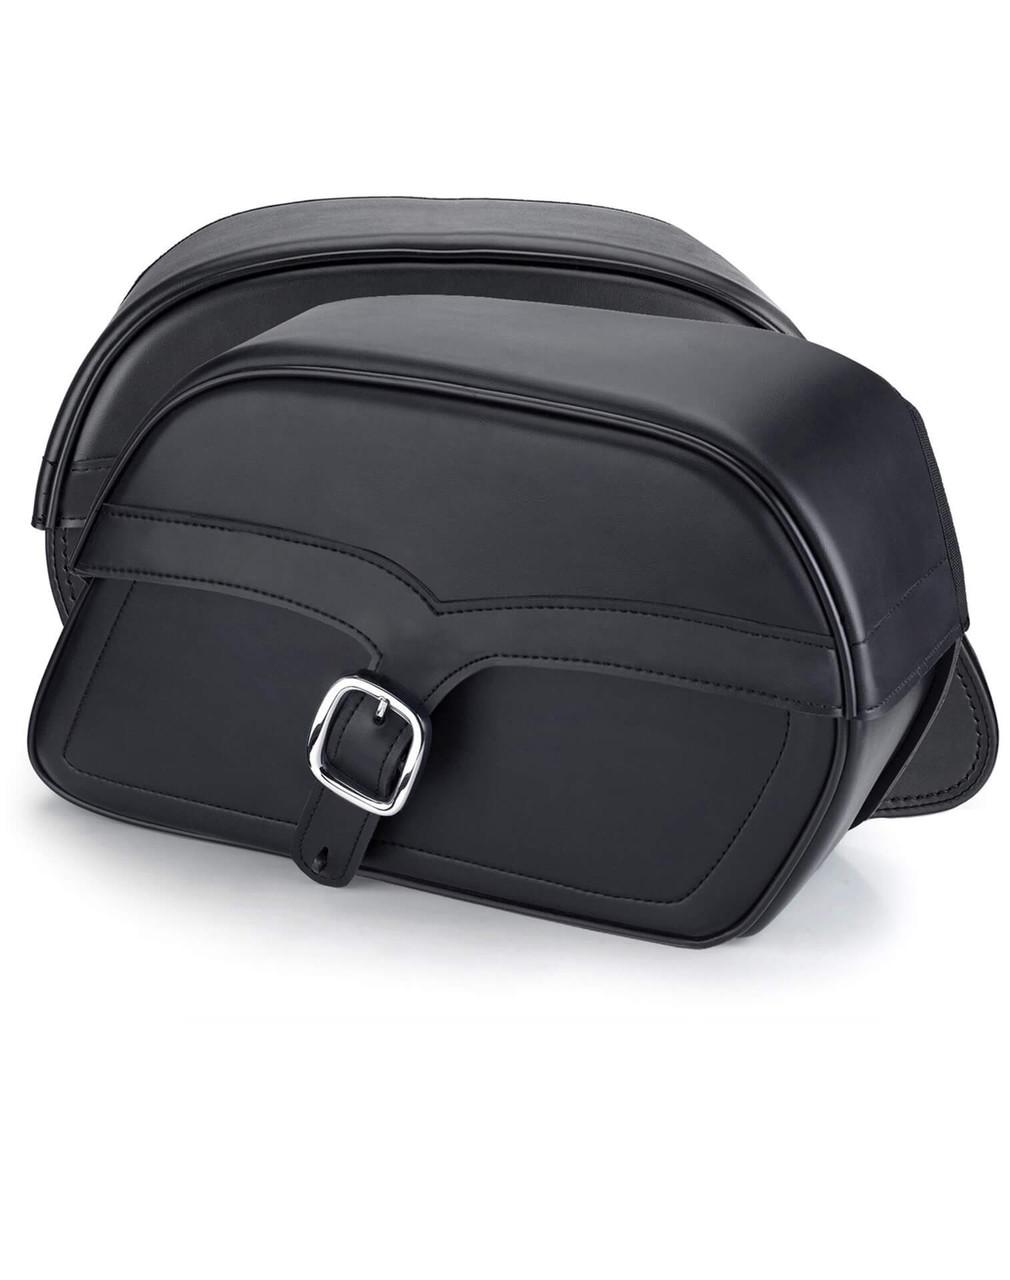 Honda 1500 Valkyrie Standard SS Slanted L Motorcycle saddlebags Both Bags View